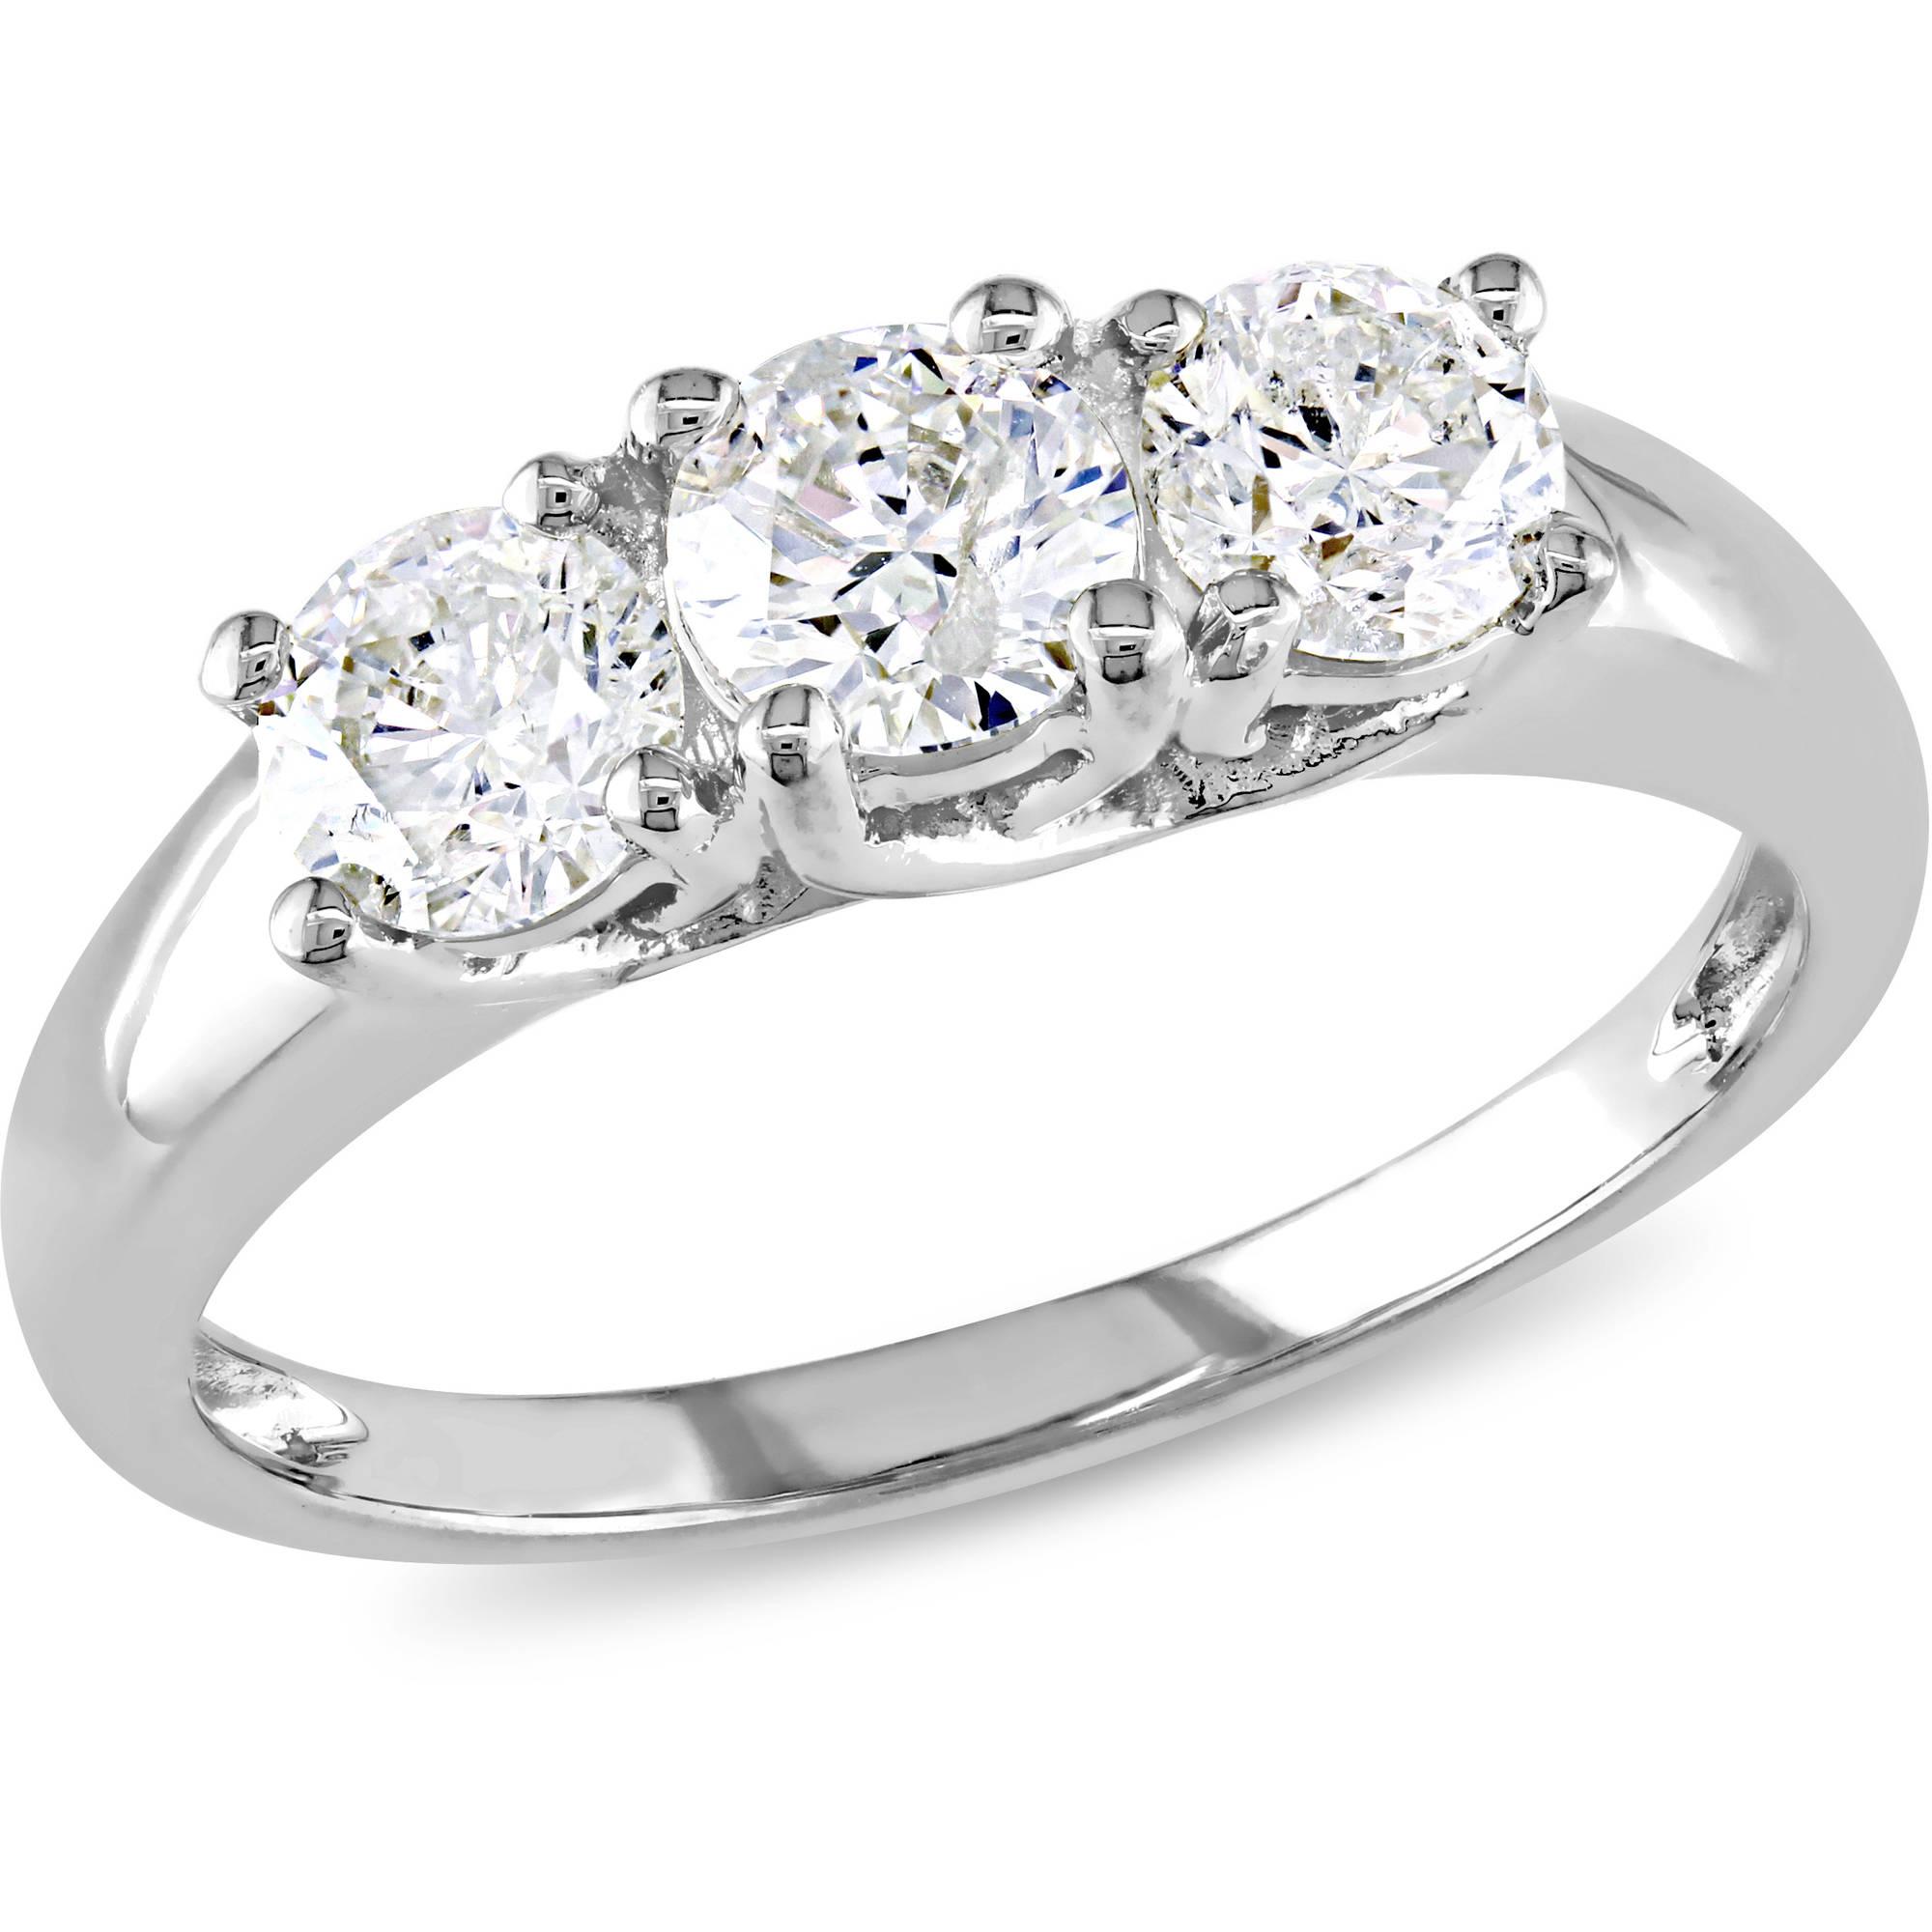 Miabella 1 Carat T.W. Diamond Three-Stone Engagement Ring in 14kt White Gold, IGL Certified